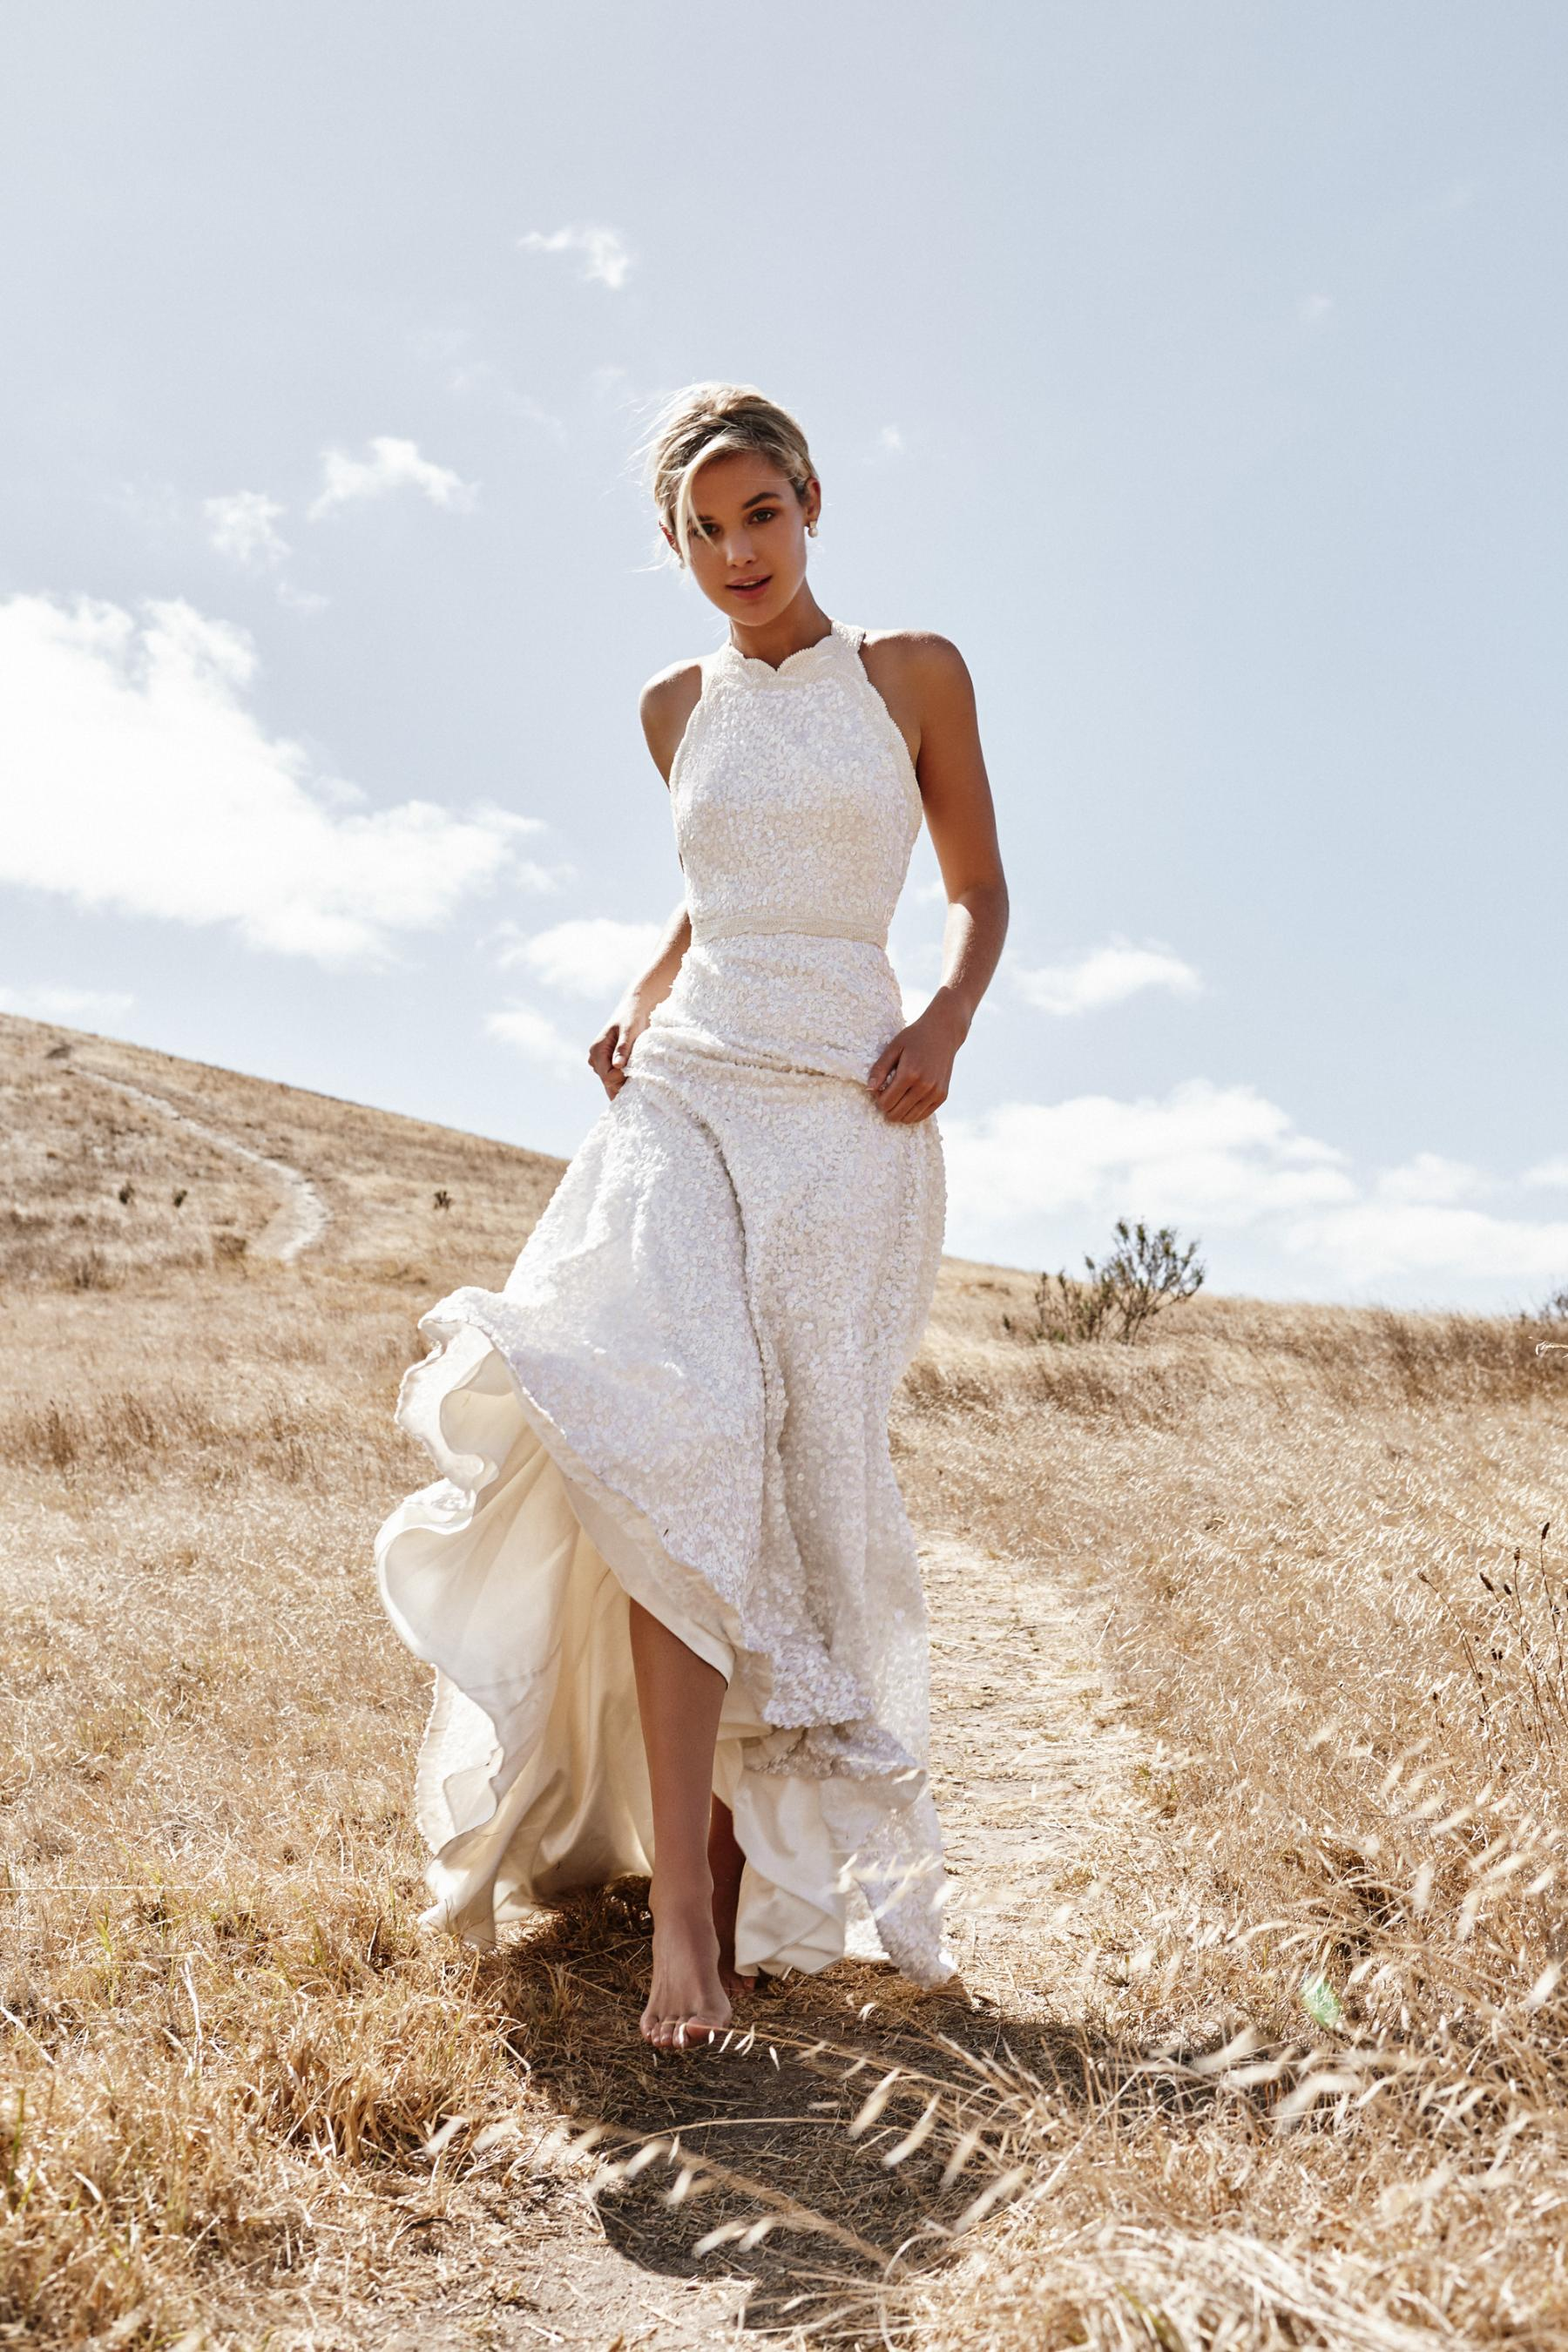 Bridal Designer Karen Willis Holmes has a Brisbane Bridal Boutique